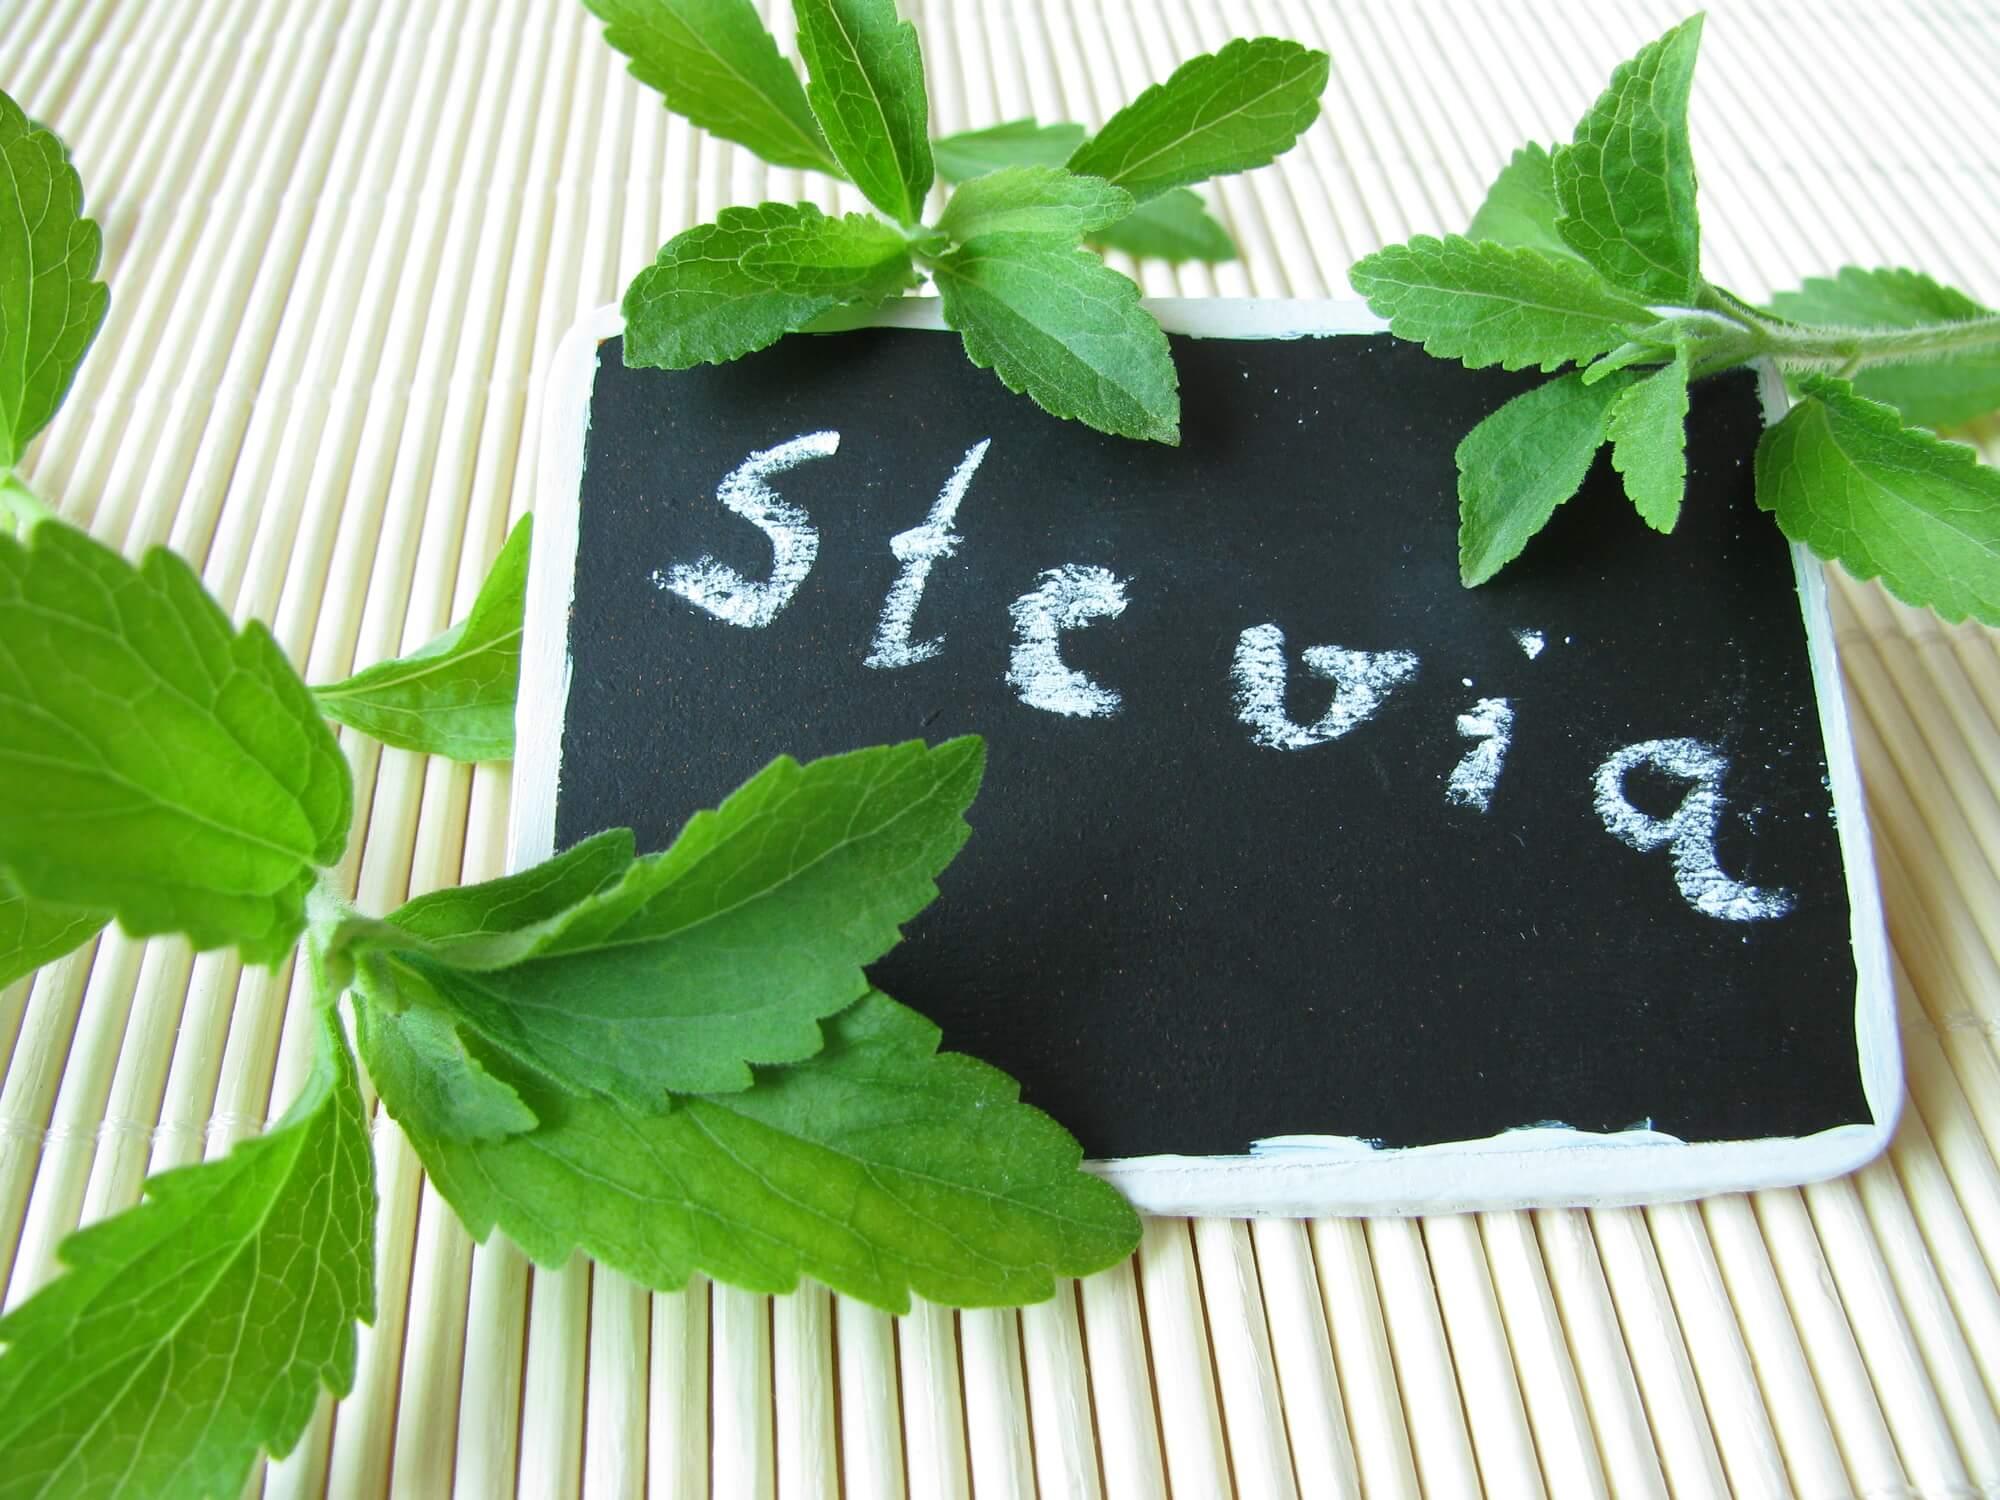 steviosid